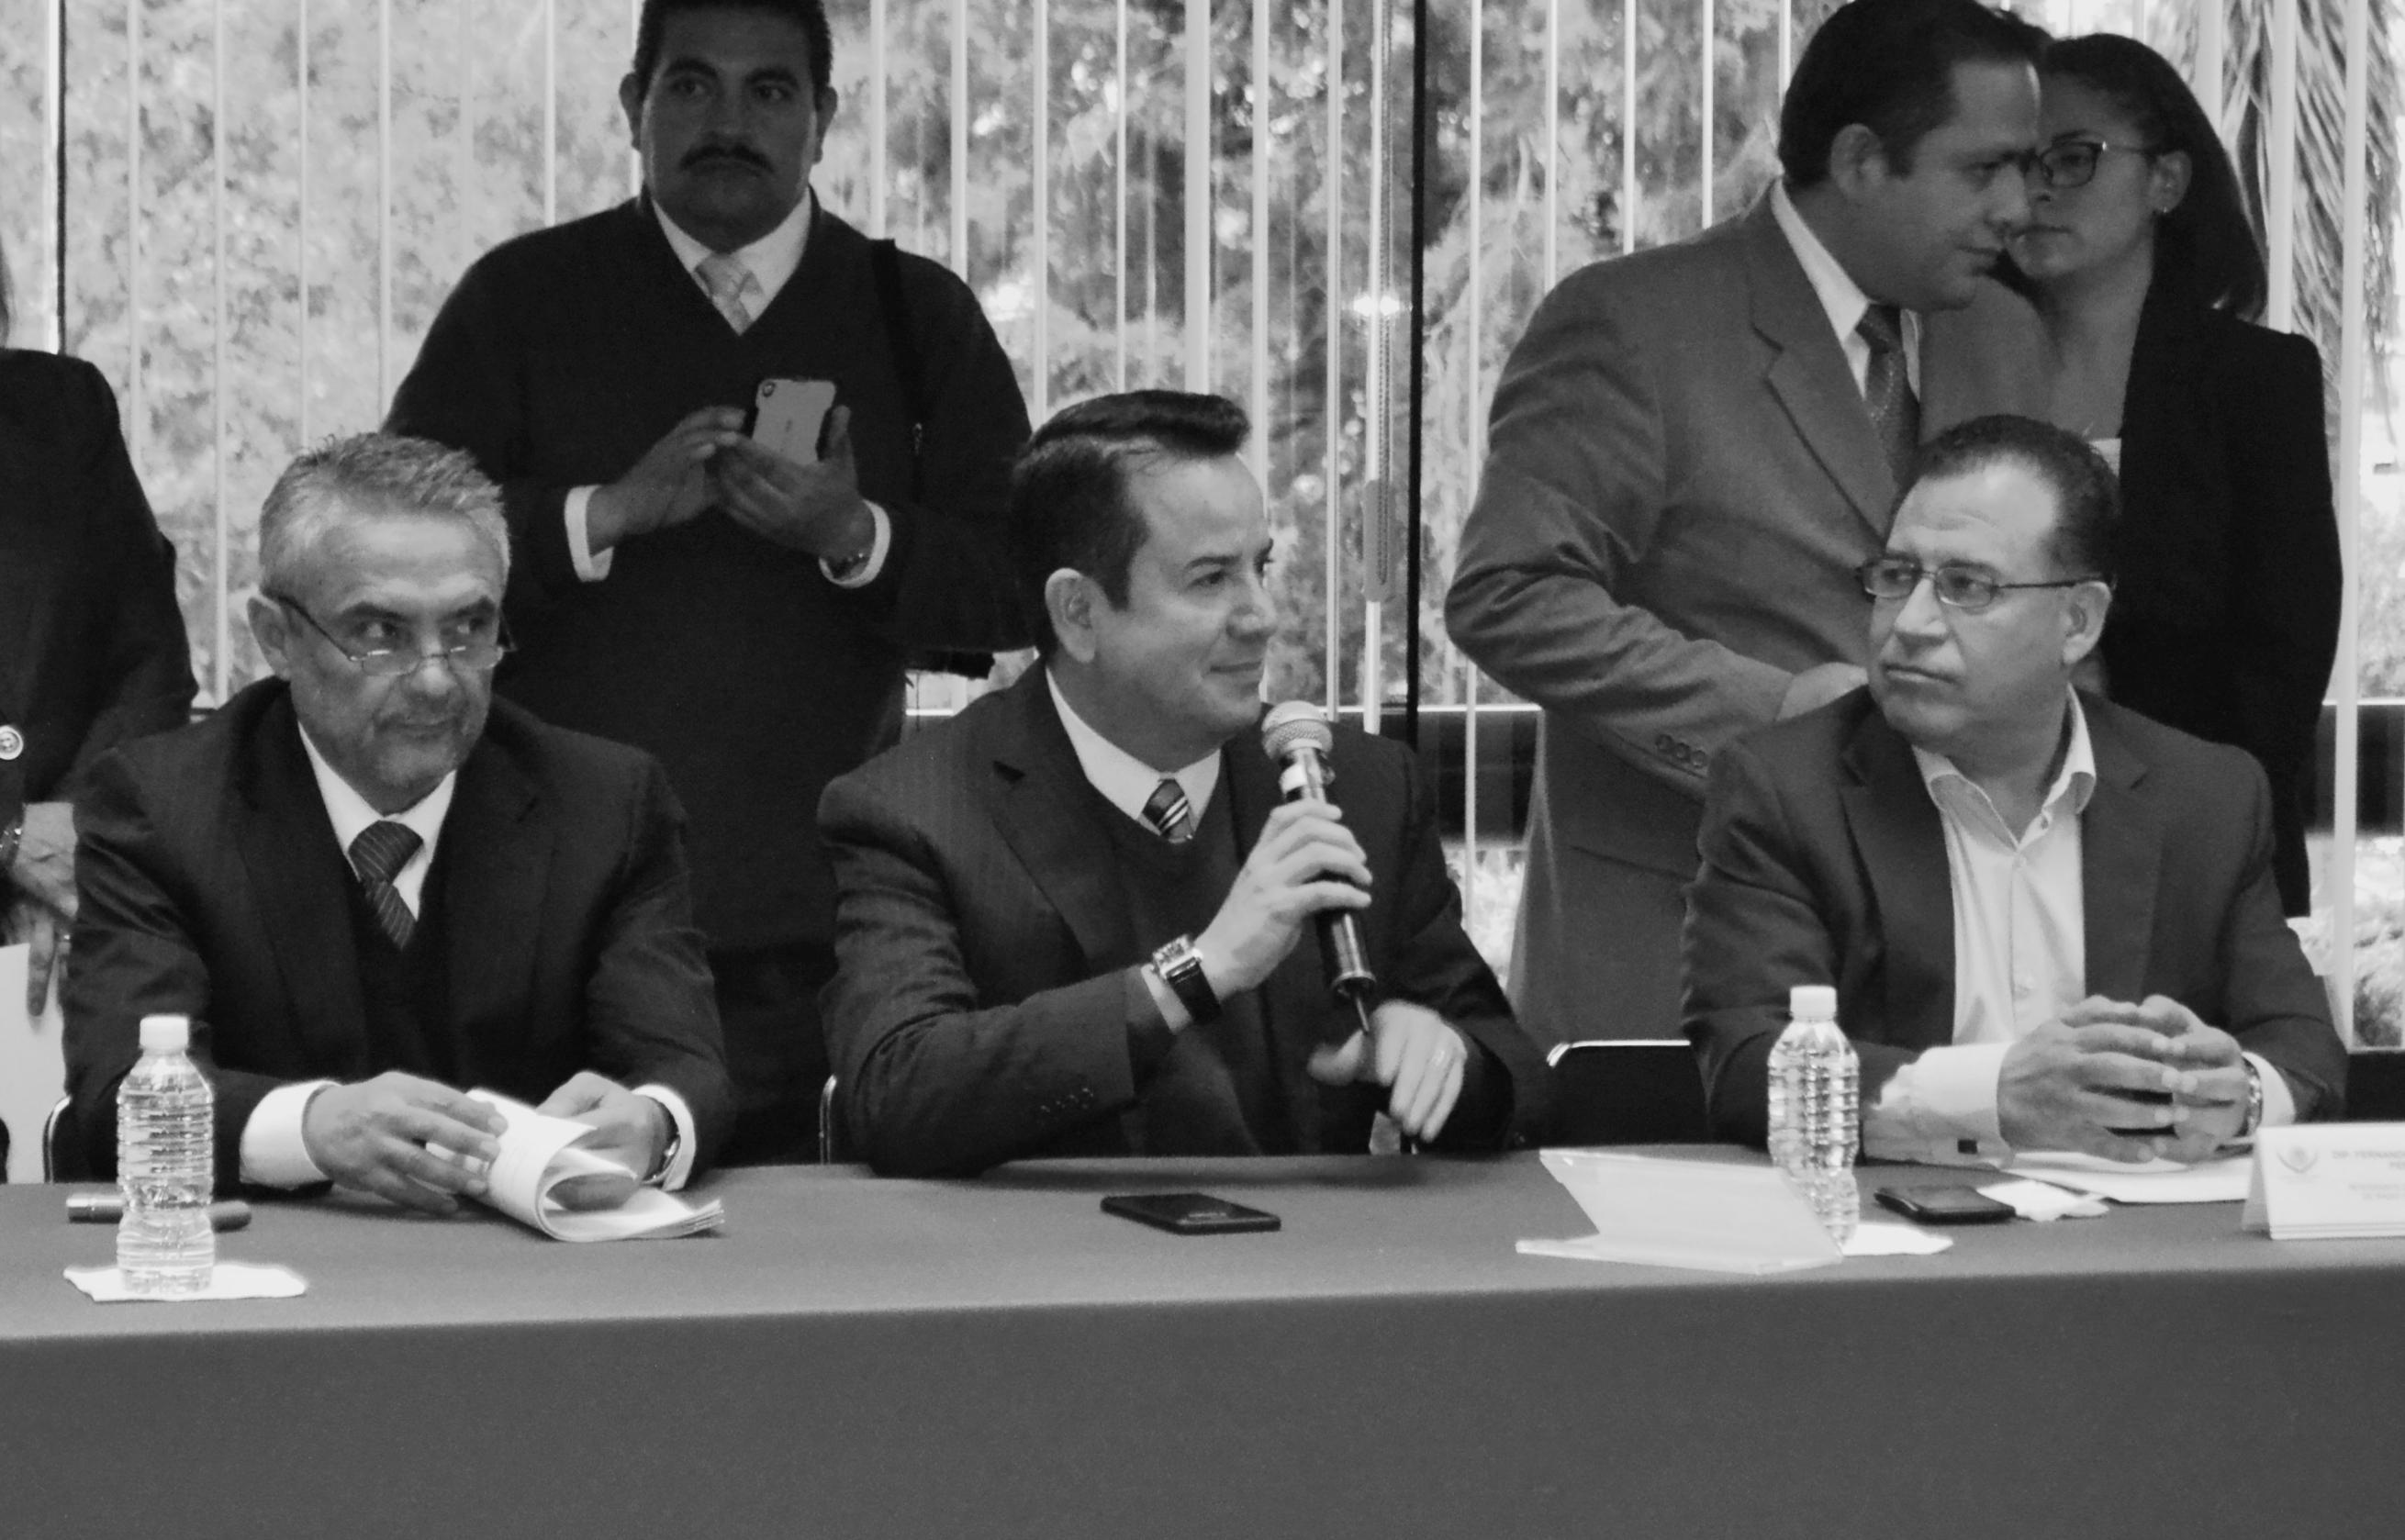 ASAMBLEA DE CDM SERÁ PLURAL: BENJAMÍN MEDRANO